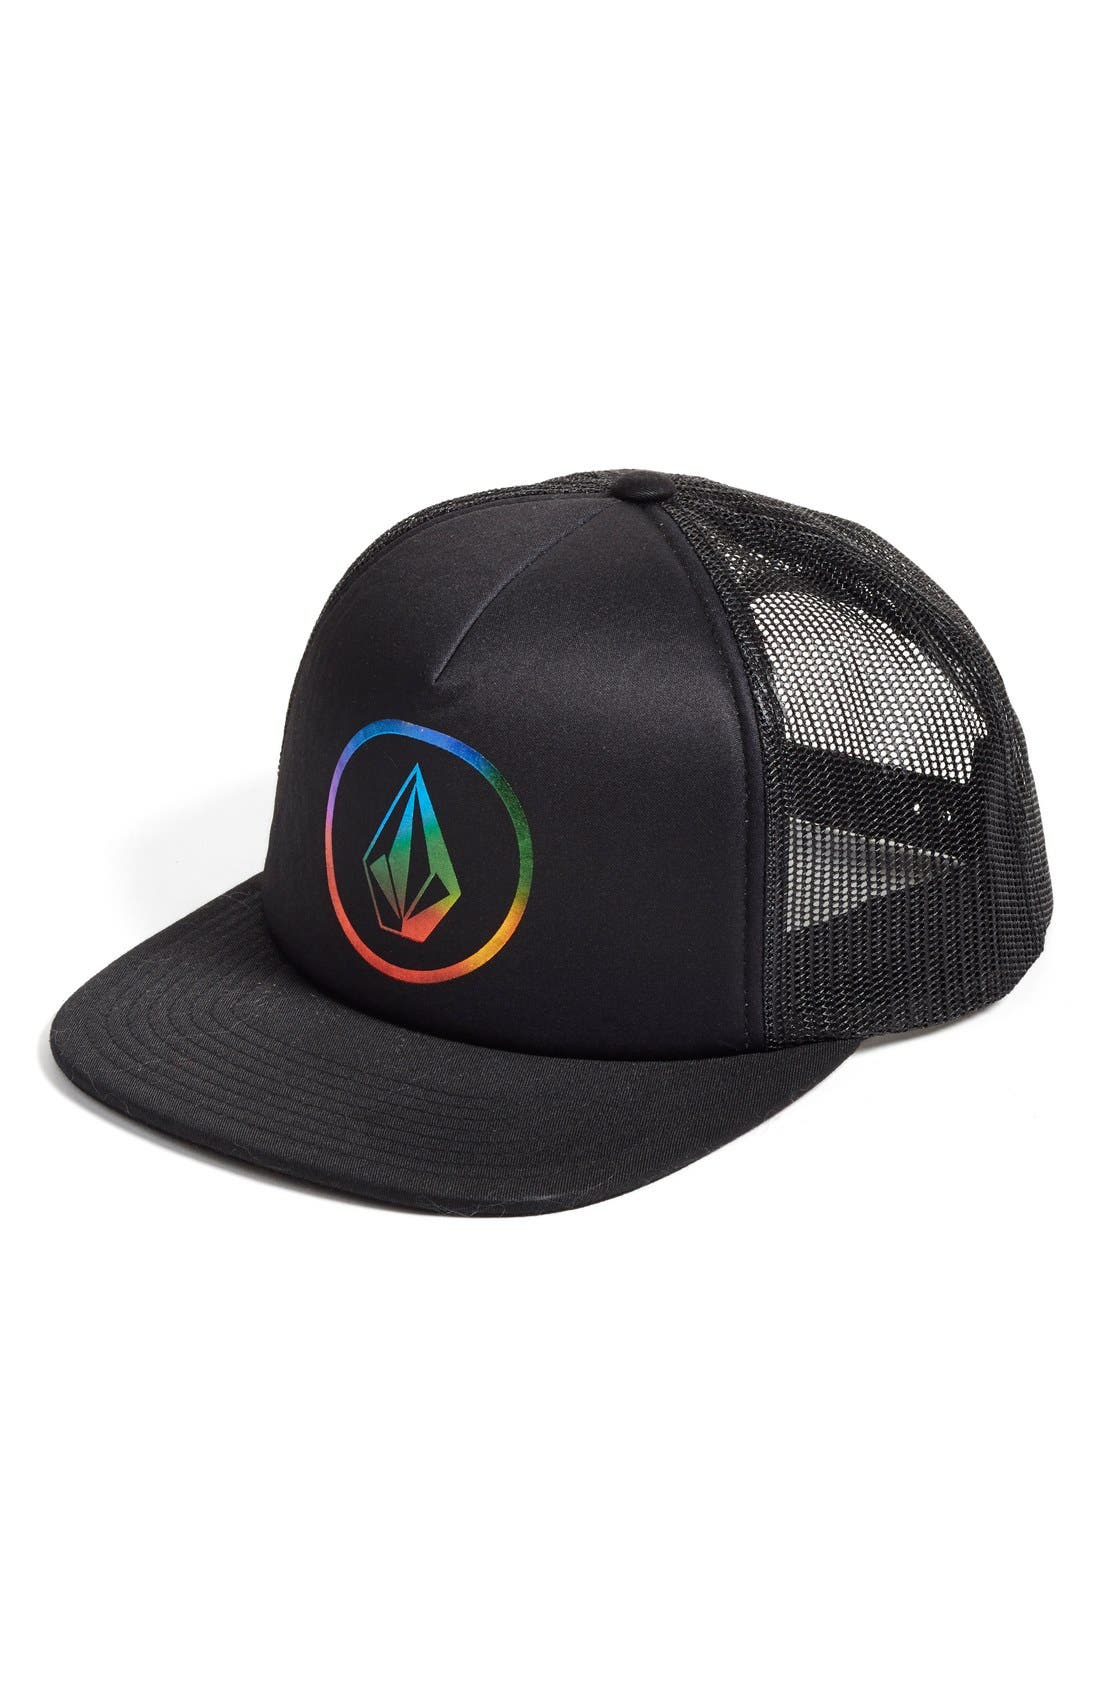 Main Image - Volcom 'Keep Truckin' Trucker Hat